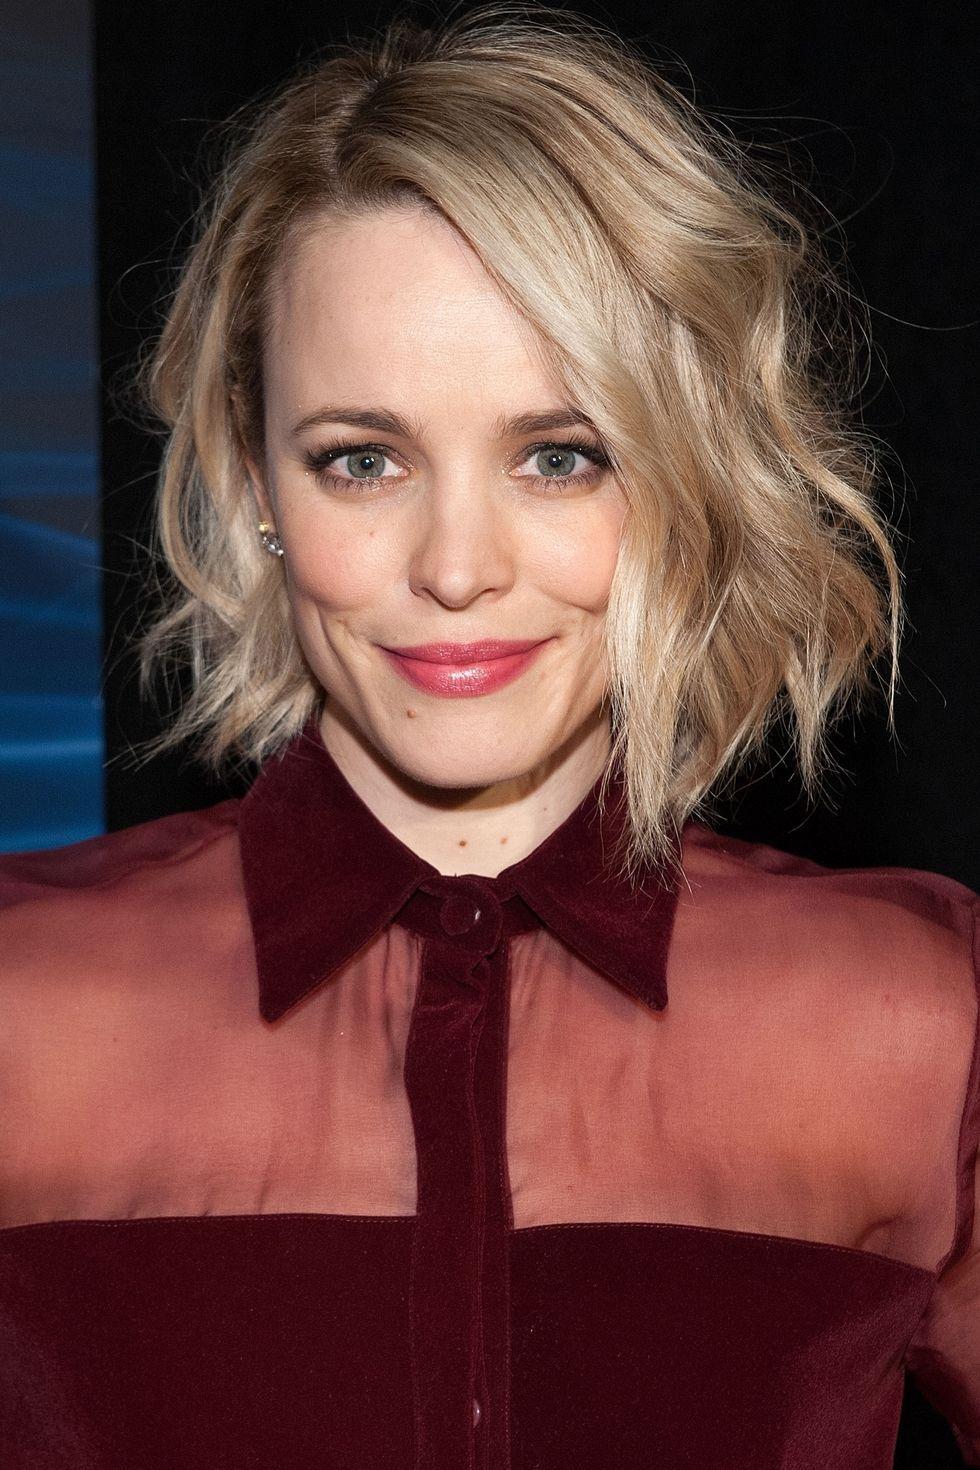 Rachel mcadams hair color pinterest rachel mcadams celebrity